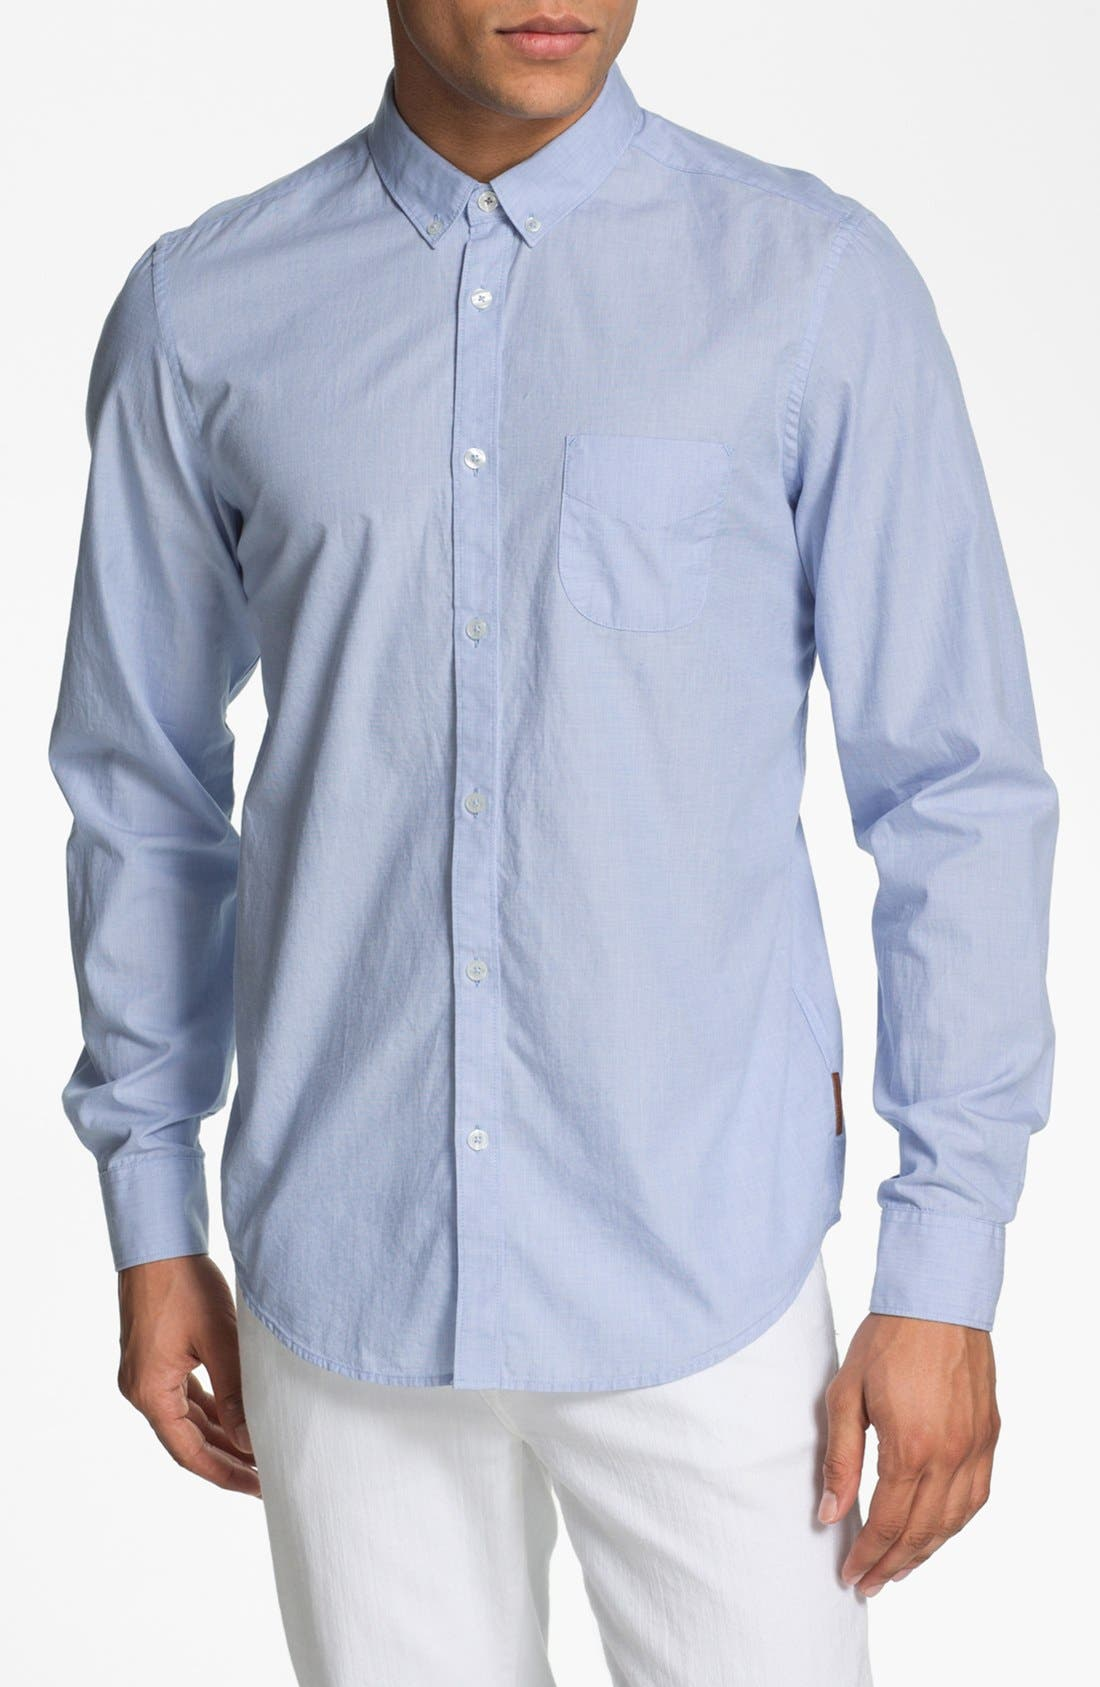 Alternate Image 1 Selected - Ben Sherman Mod Fit Sport Shirt